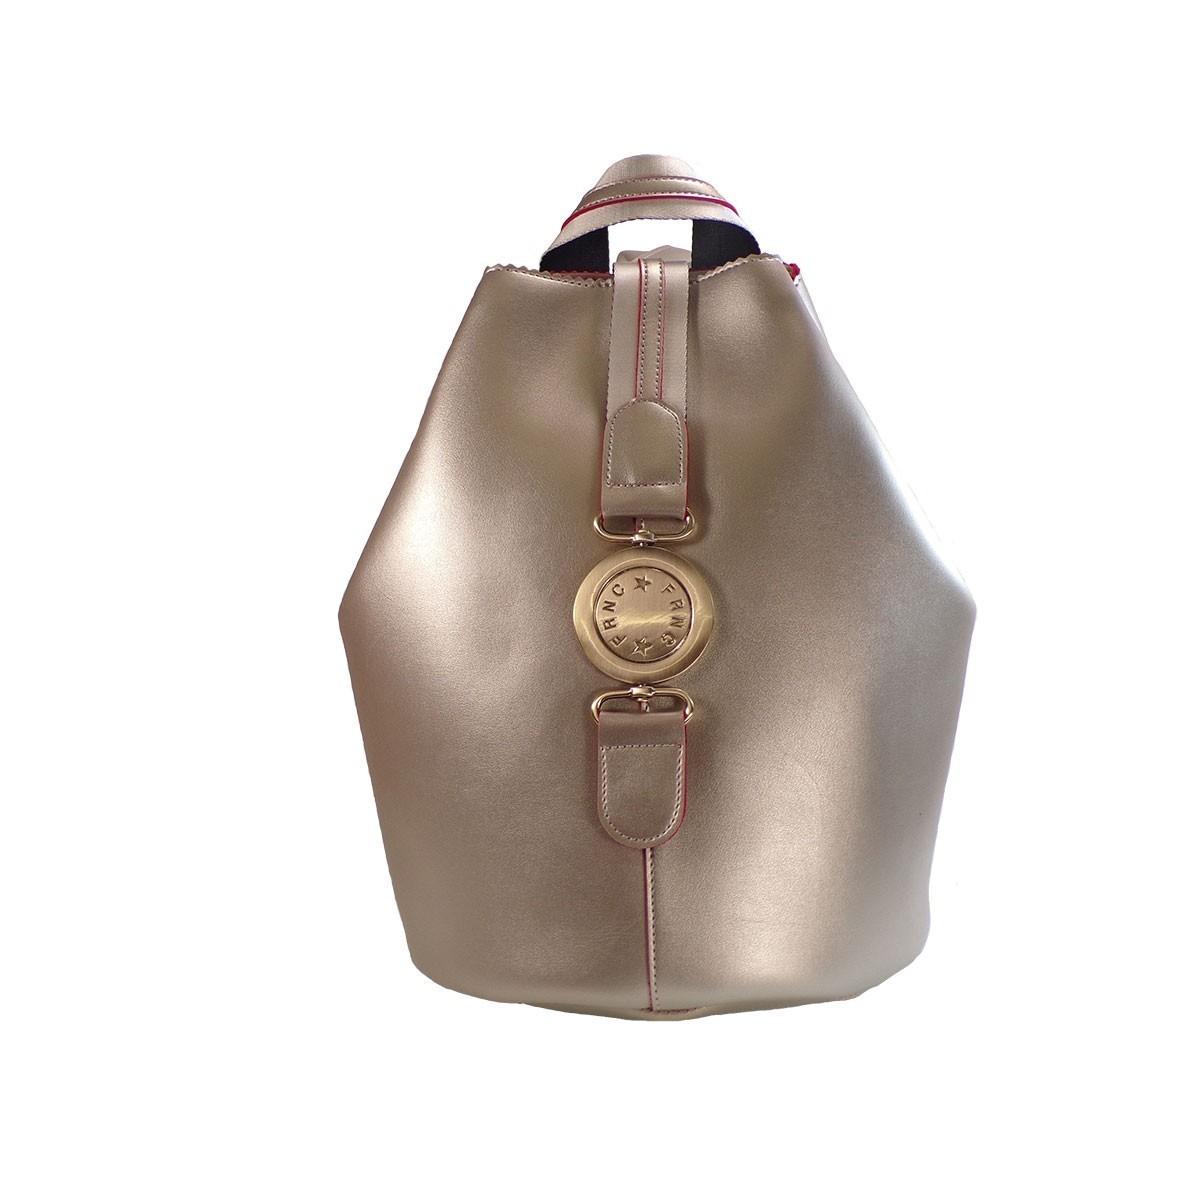 7606798e3c FRNC FRANCESCO Τσάντα Γυναικεία Πλάτης-Backpack 563 Πλατίνα Δέρμα ...